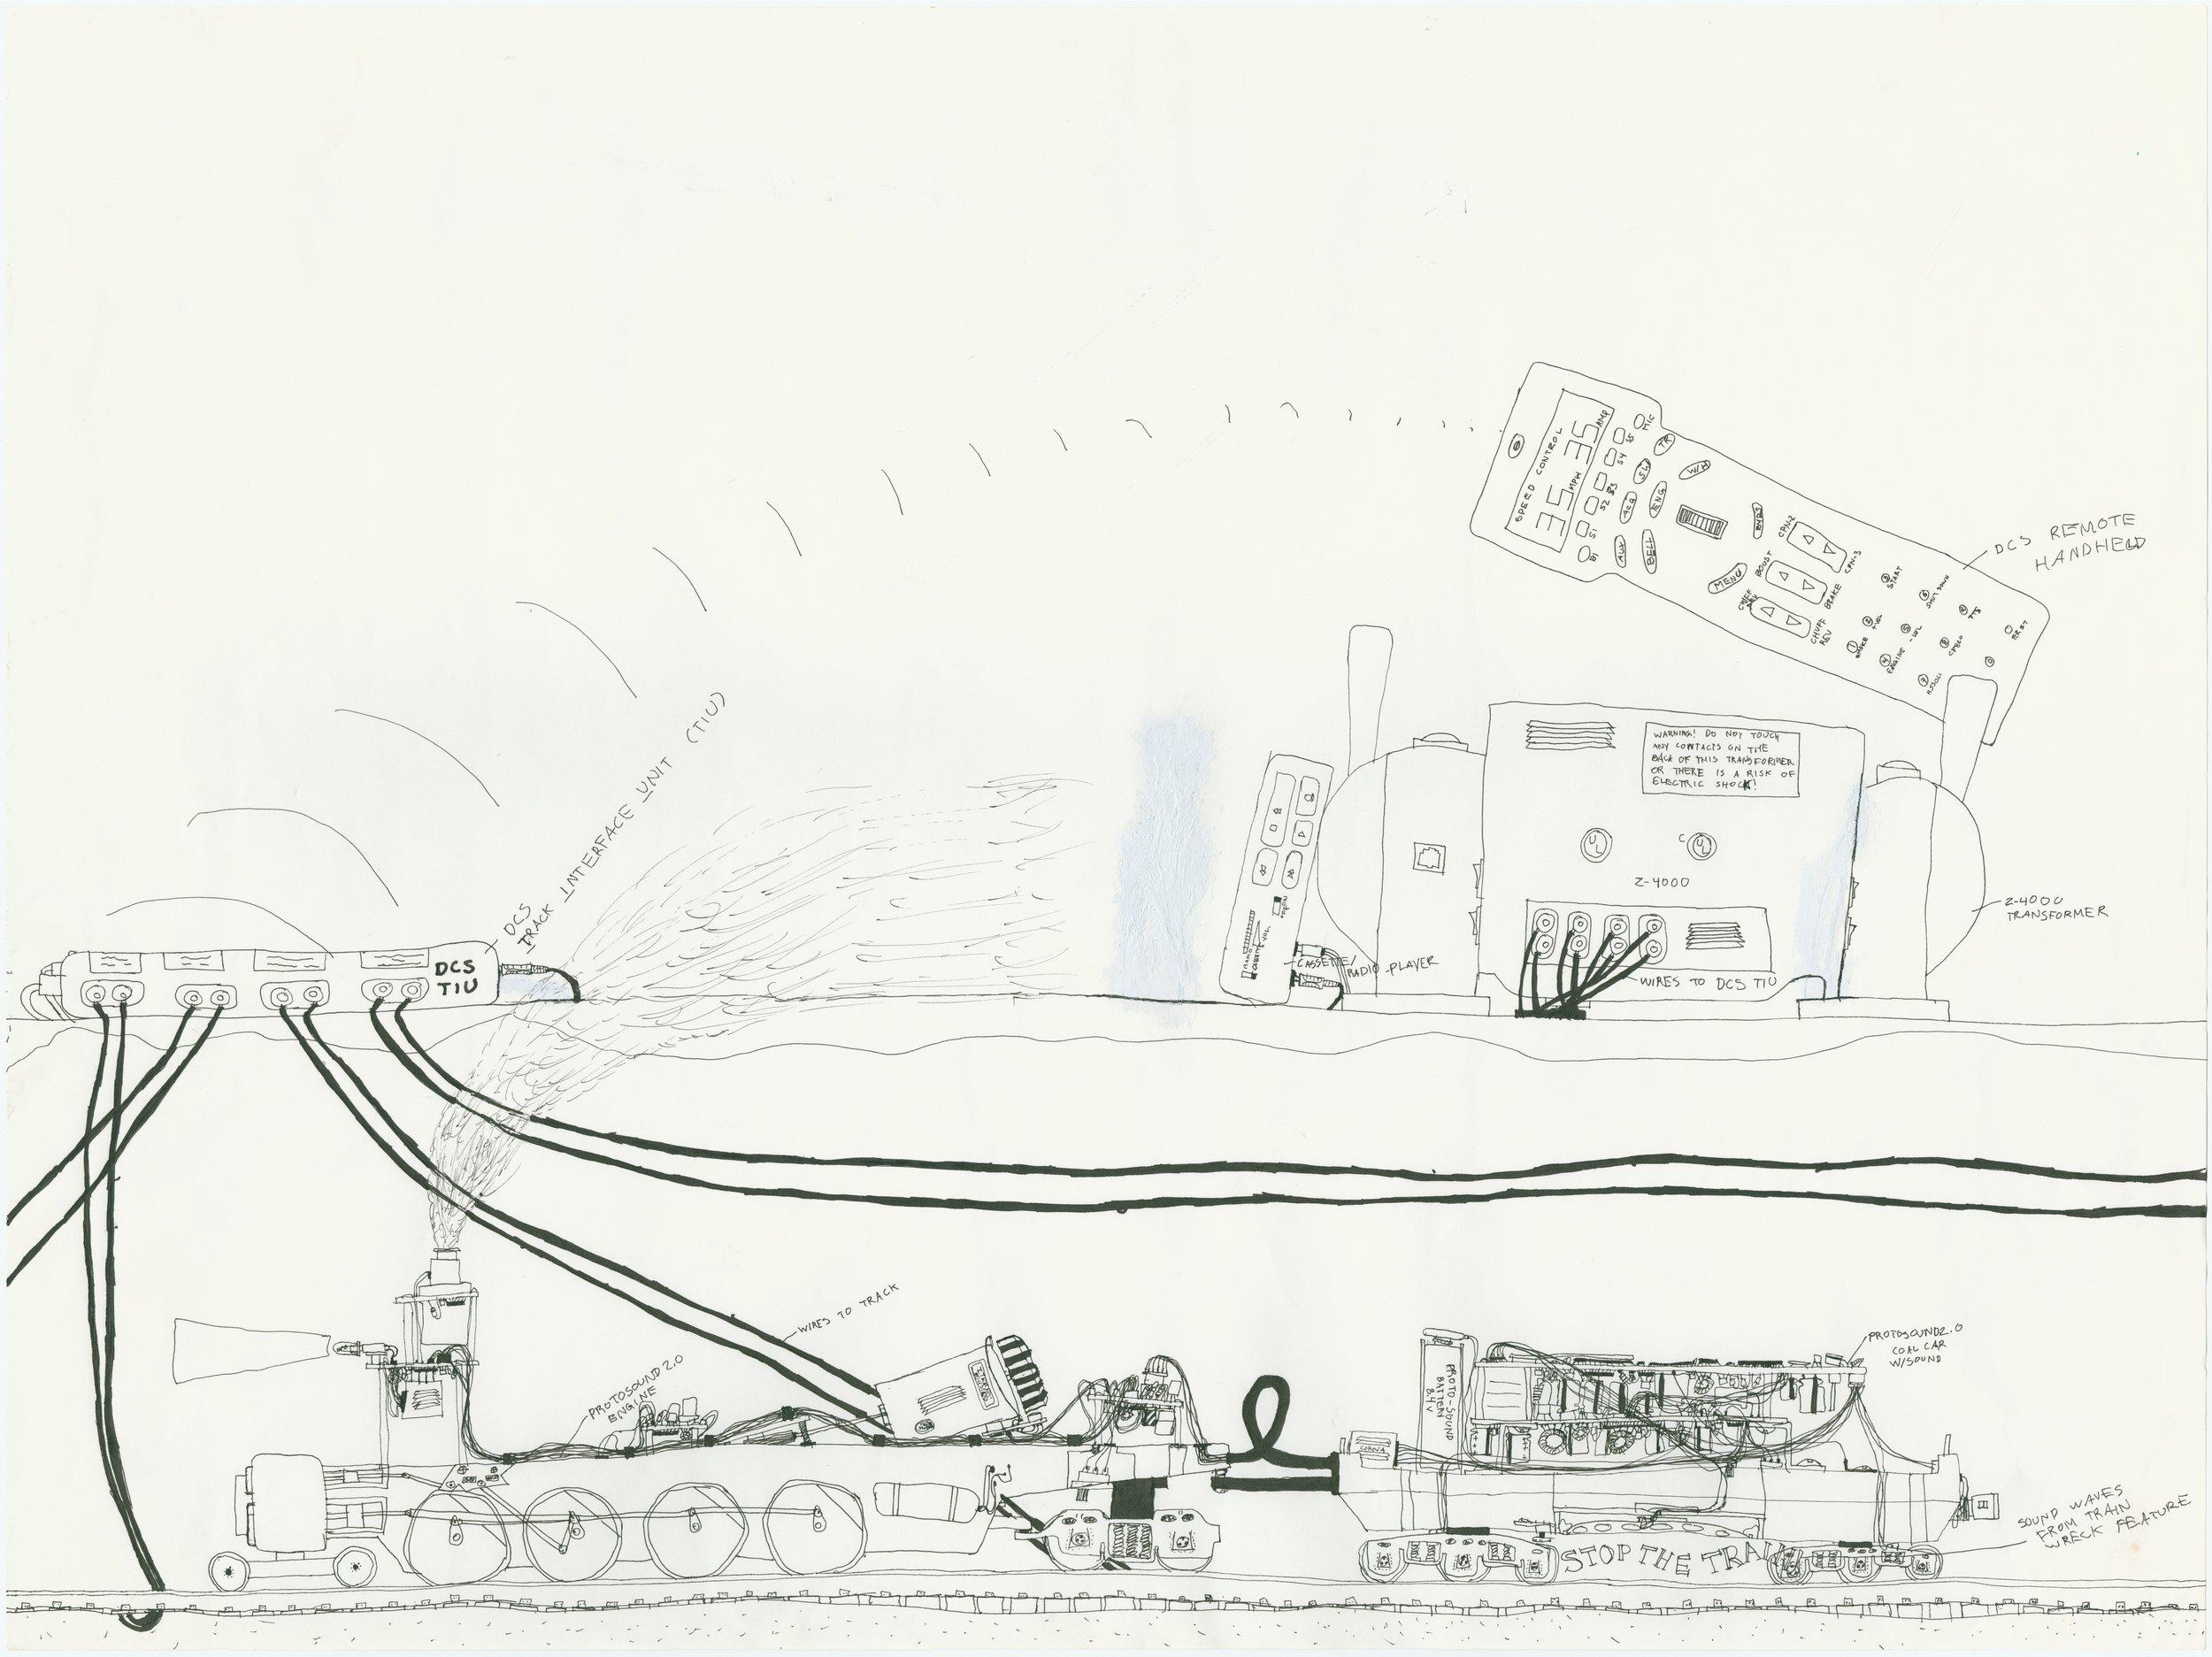 200X - 002 - MTH train controller schematic.pdf0000.jpg